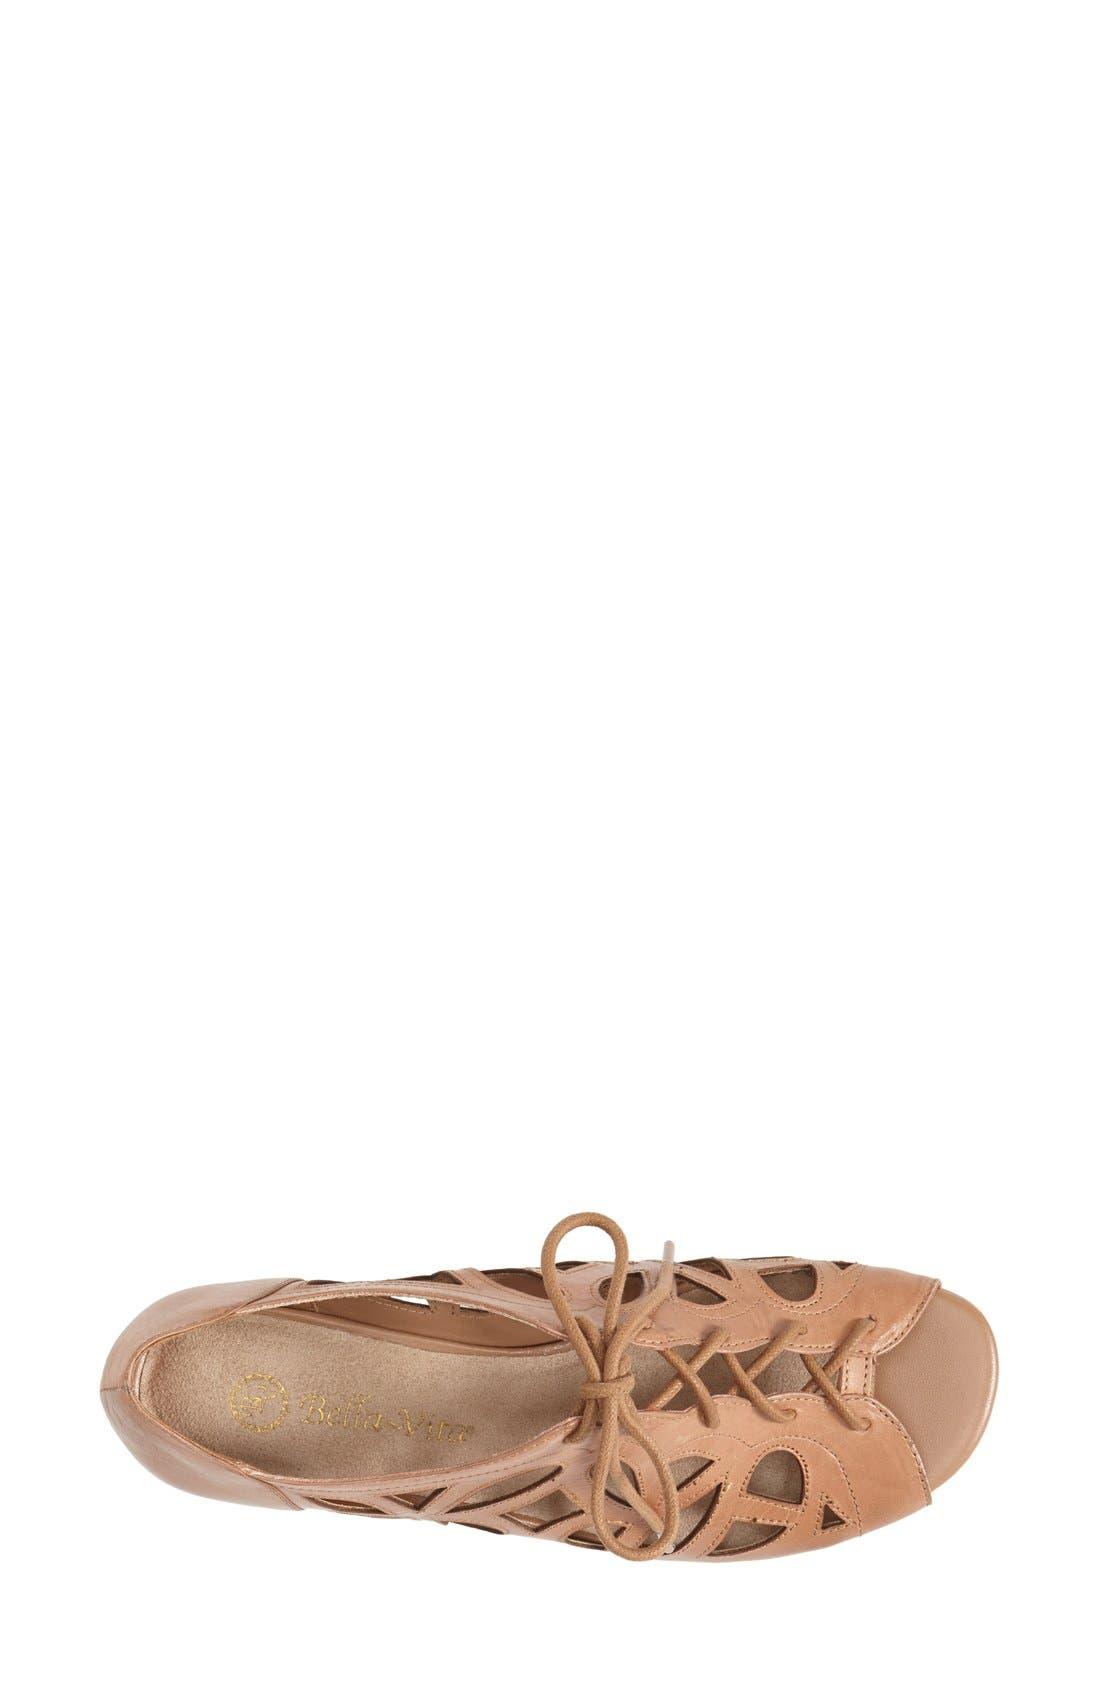 Alternate Image 3  - Bella Vita 'Pixie' Lace Up Cutout Leather Sandal